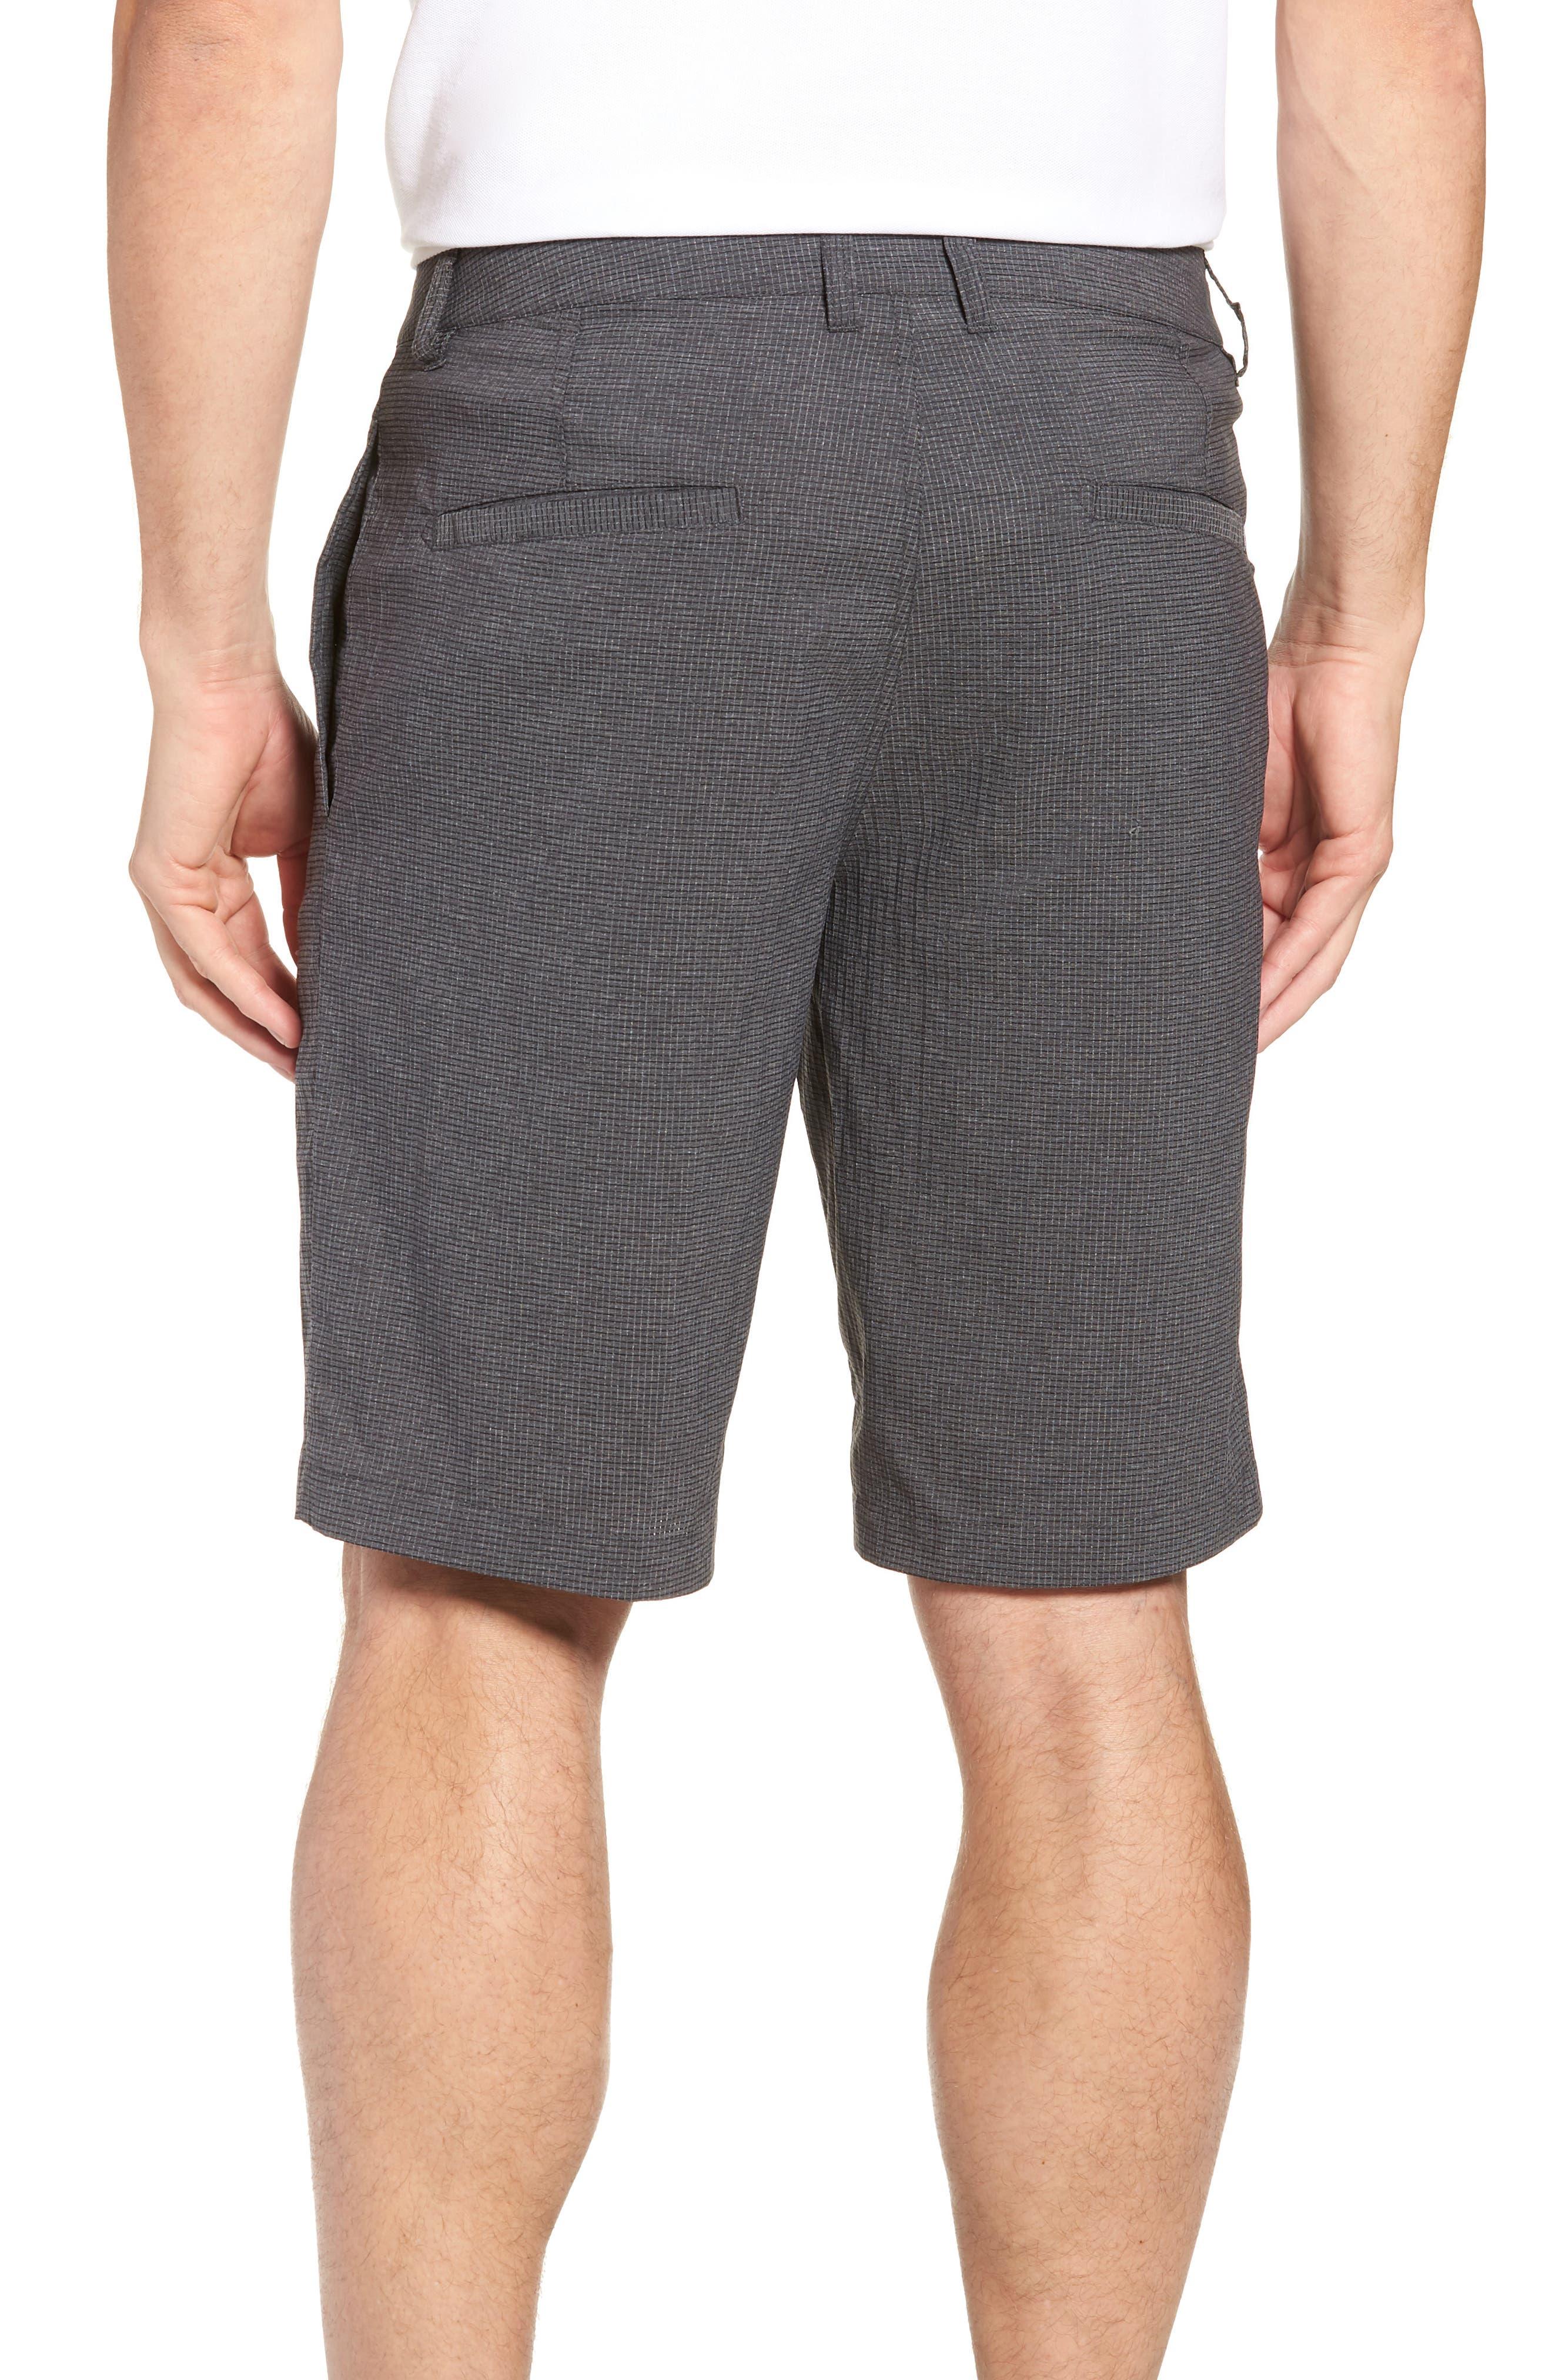 Peel Out Shorts,                             Alternate thumbnail 2, color,                             GREY PINSTRIPE